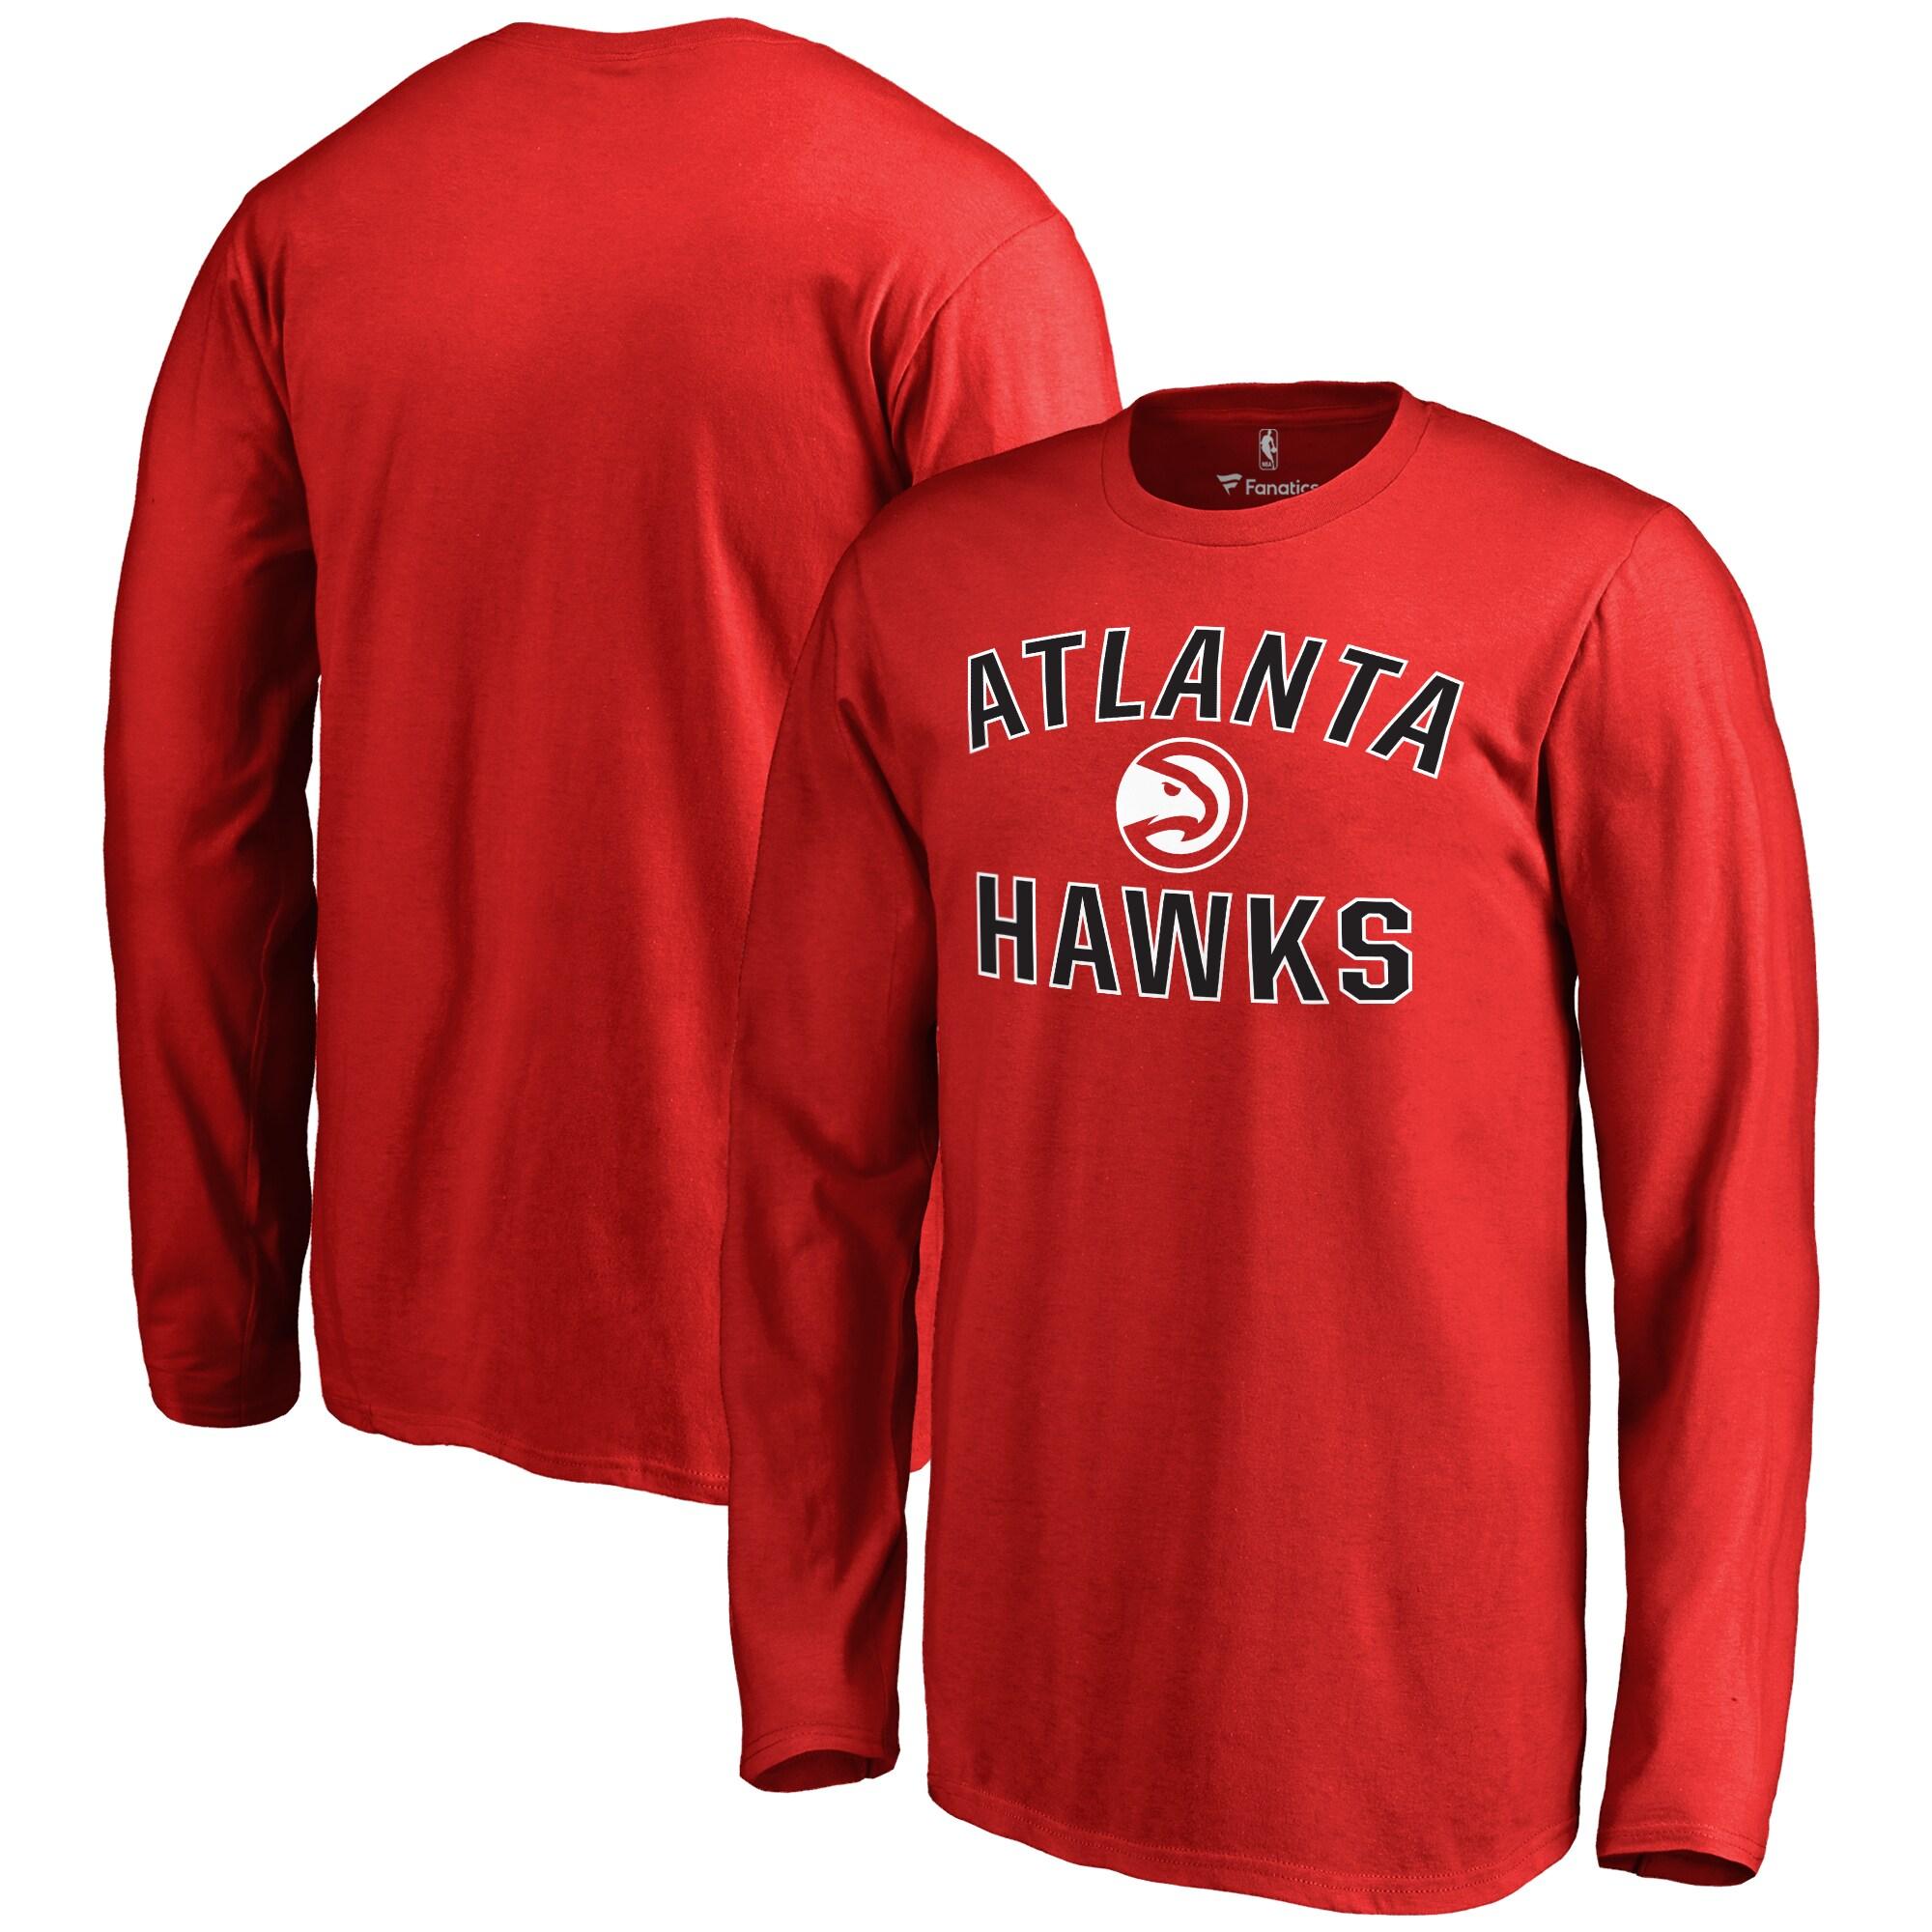 Atlanta Hawks Youth Victory Arch Long Sleeve T-Shirt - Red